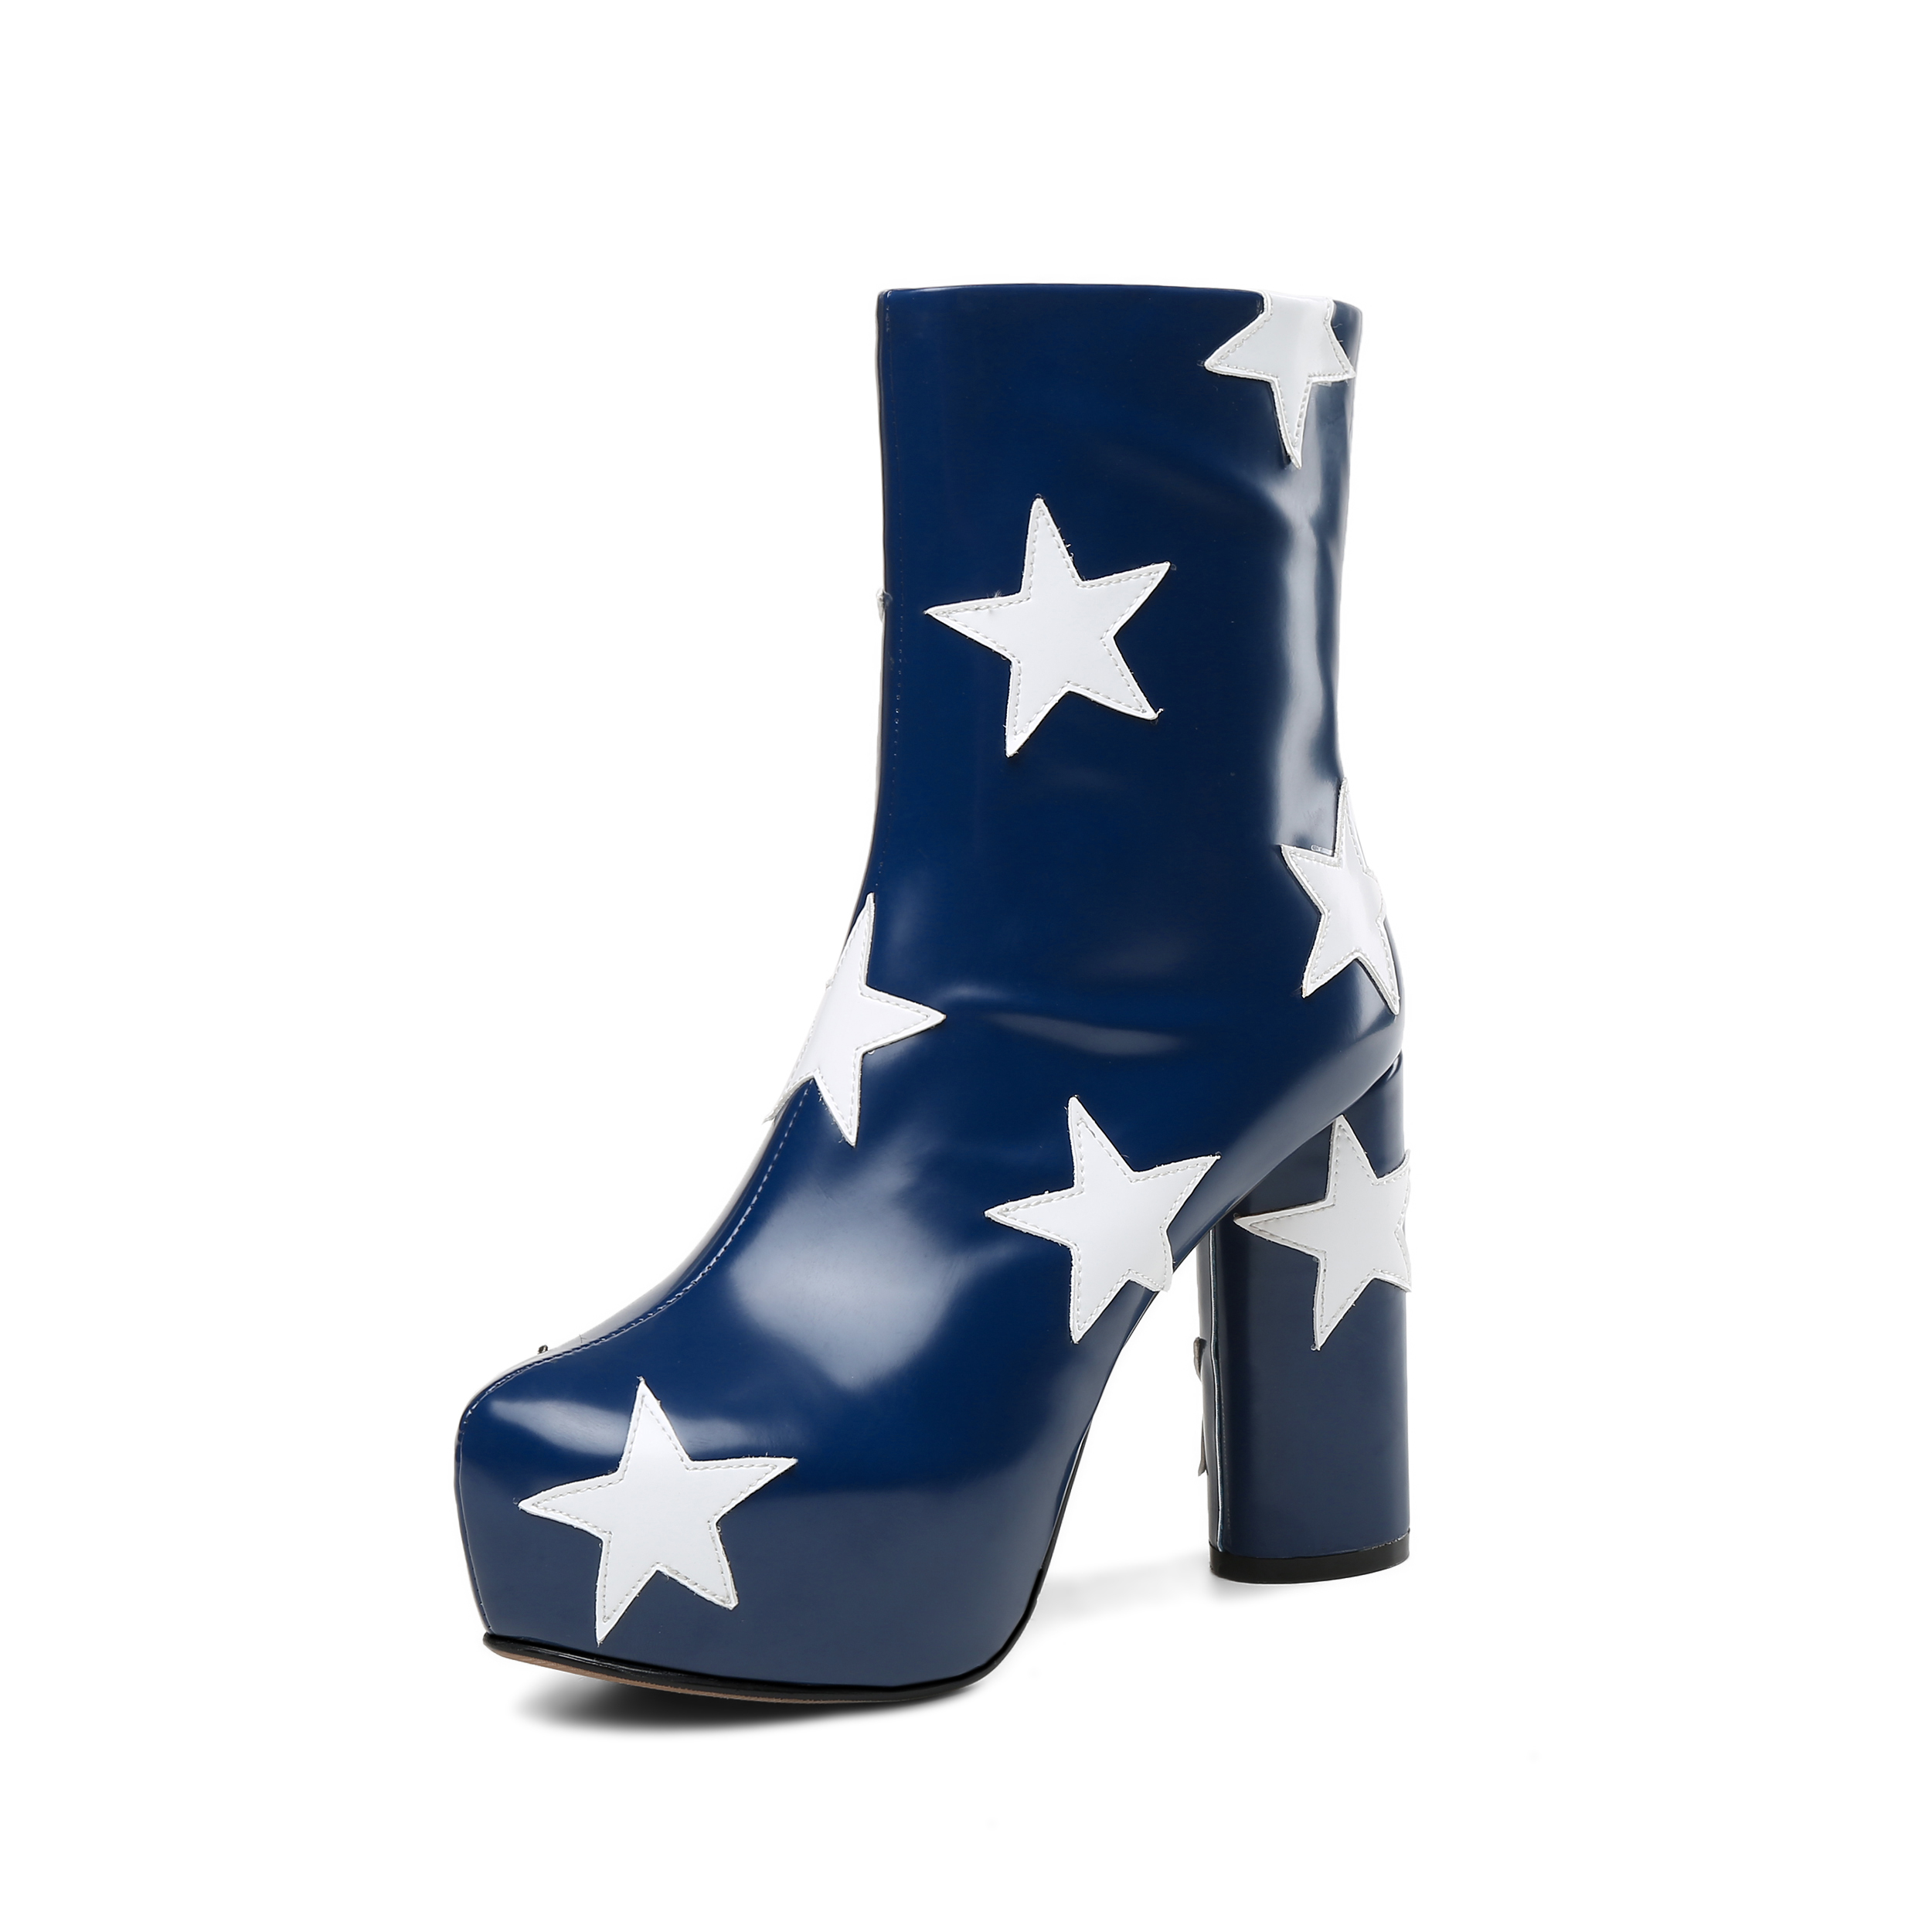 784aff279f2 US  59 - Arden Furtado winter autumn zipper chunky heels 12cm boots  platform round toe stars woman shoes ladies mid calf boots genuine leather  shoes drop ...